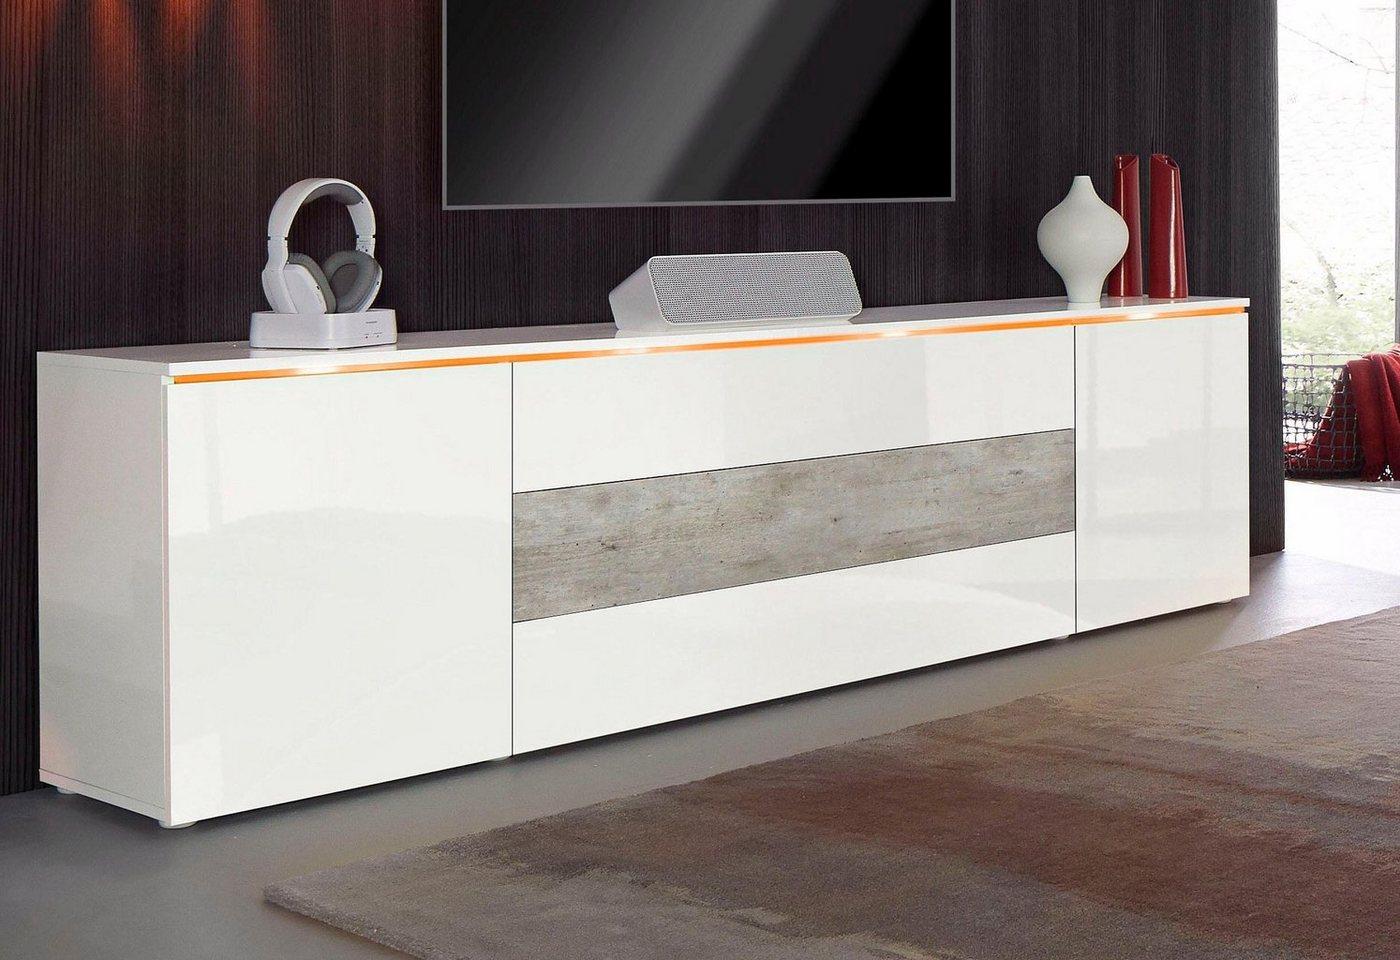 XXL-TV-meubel, breedte 200 cm